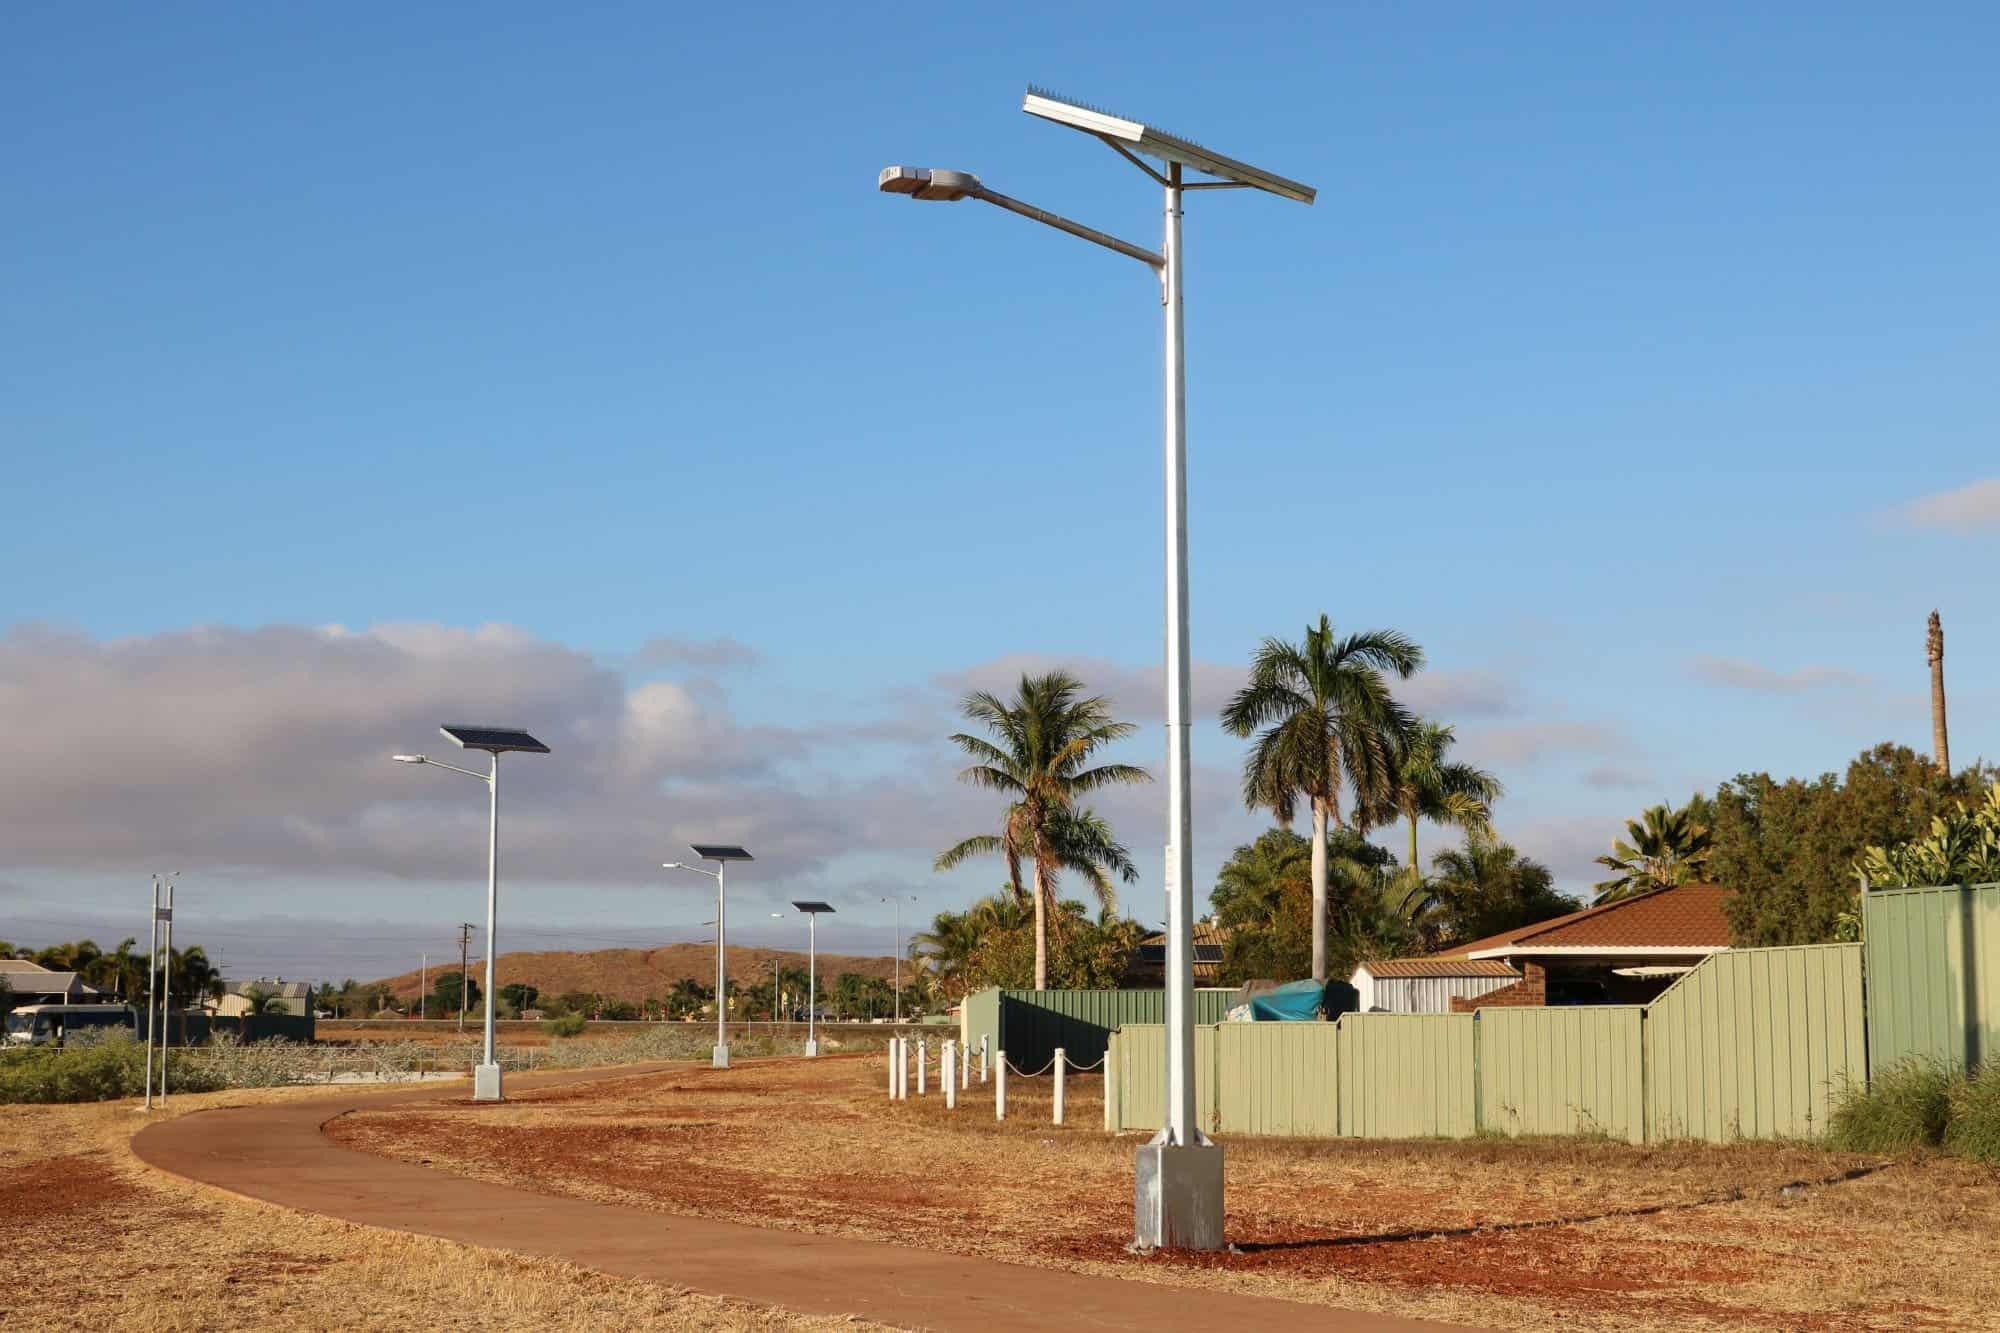 solar powered street lights in Karratha Wa